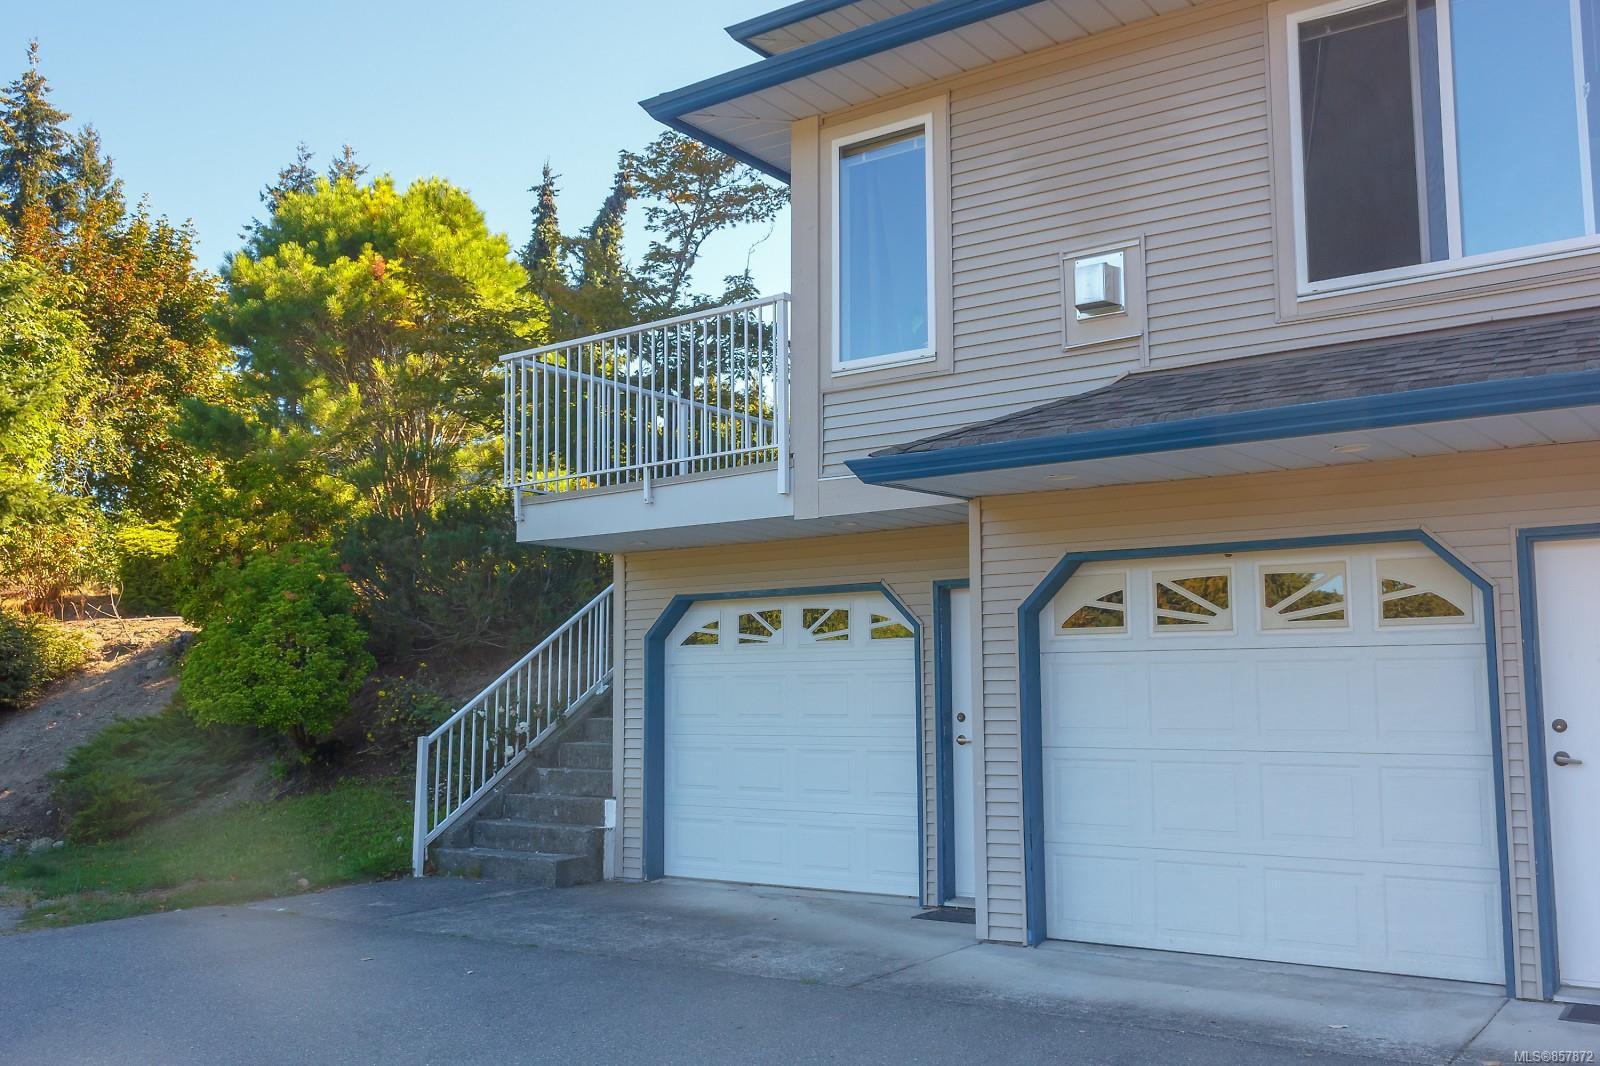 Main Photo: 101 1150 Walkem Rd in : Du Ladysmith Condo for sale (Duncan)  : MLS®# 857872